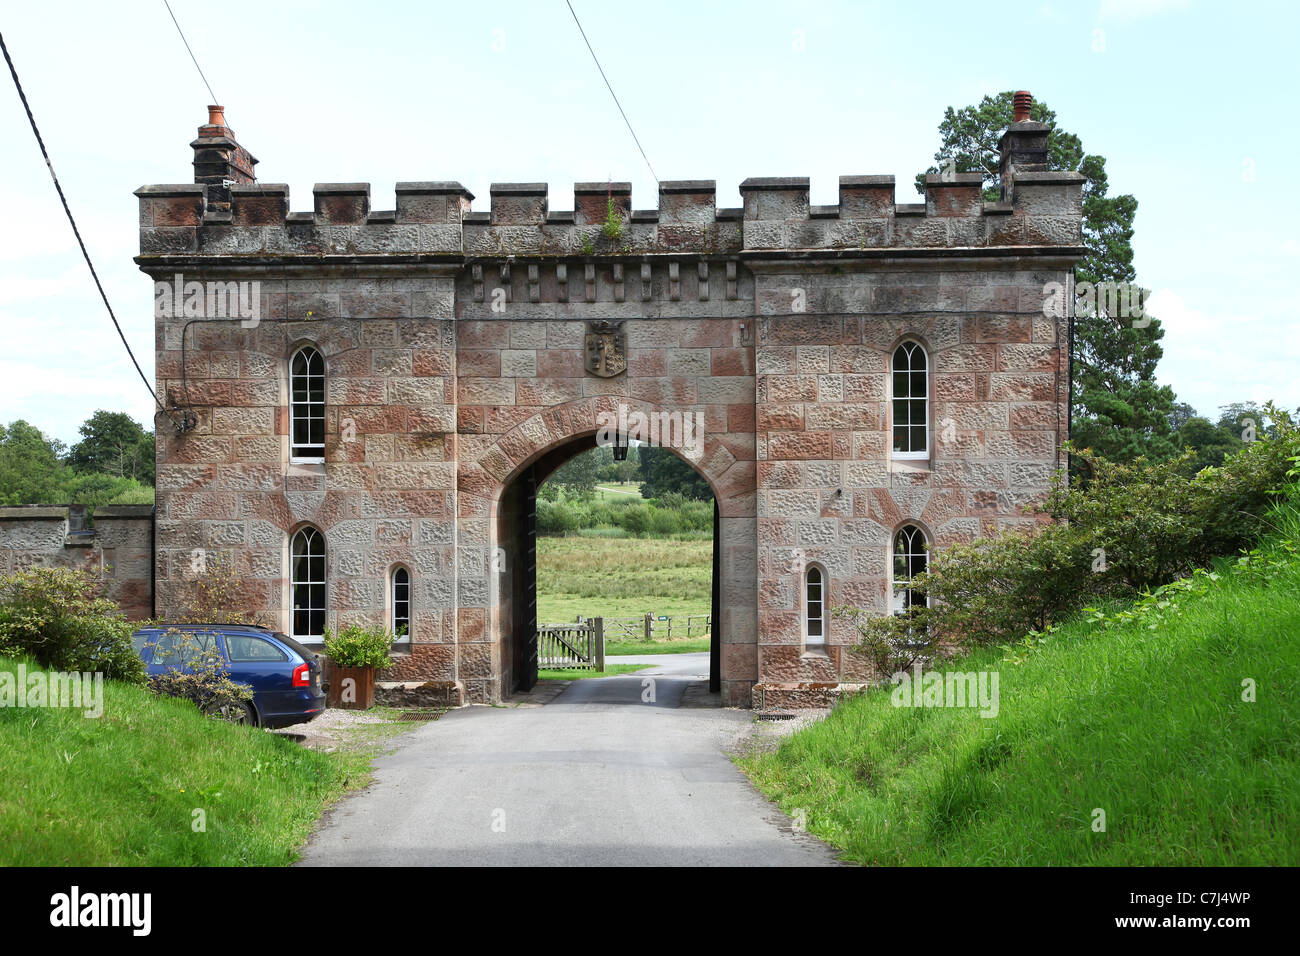 Somerset Lodge South gate house or gatehouse at Cholmondeley Castle Cheshire, England, UK - Stock Image